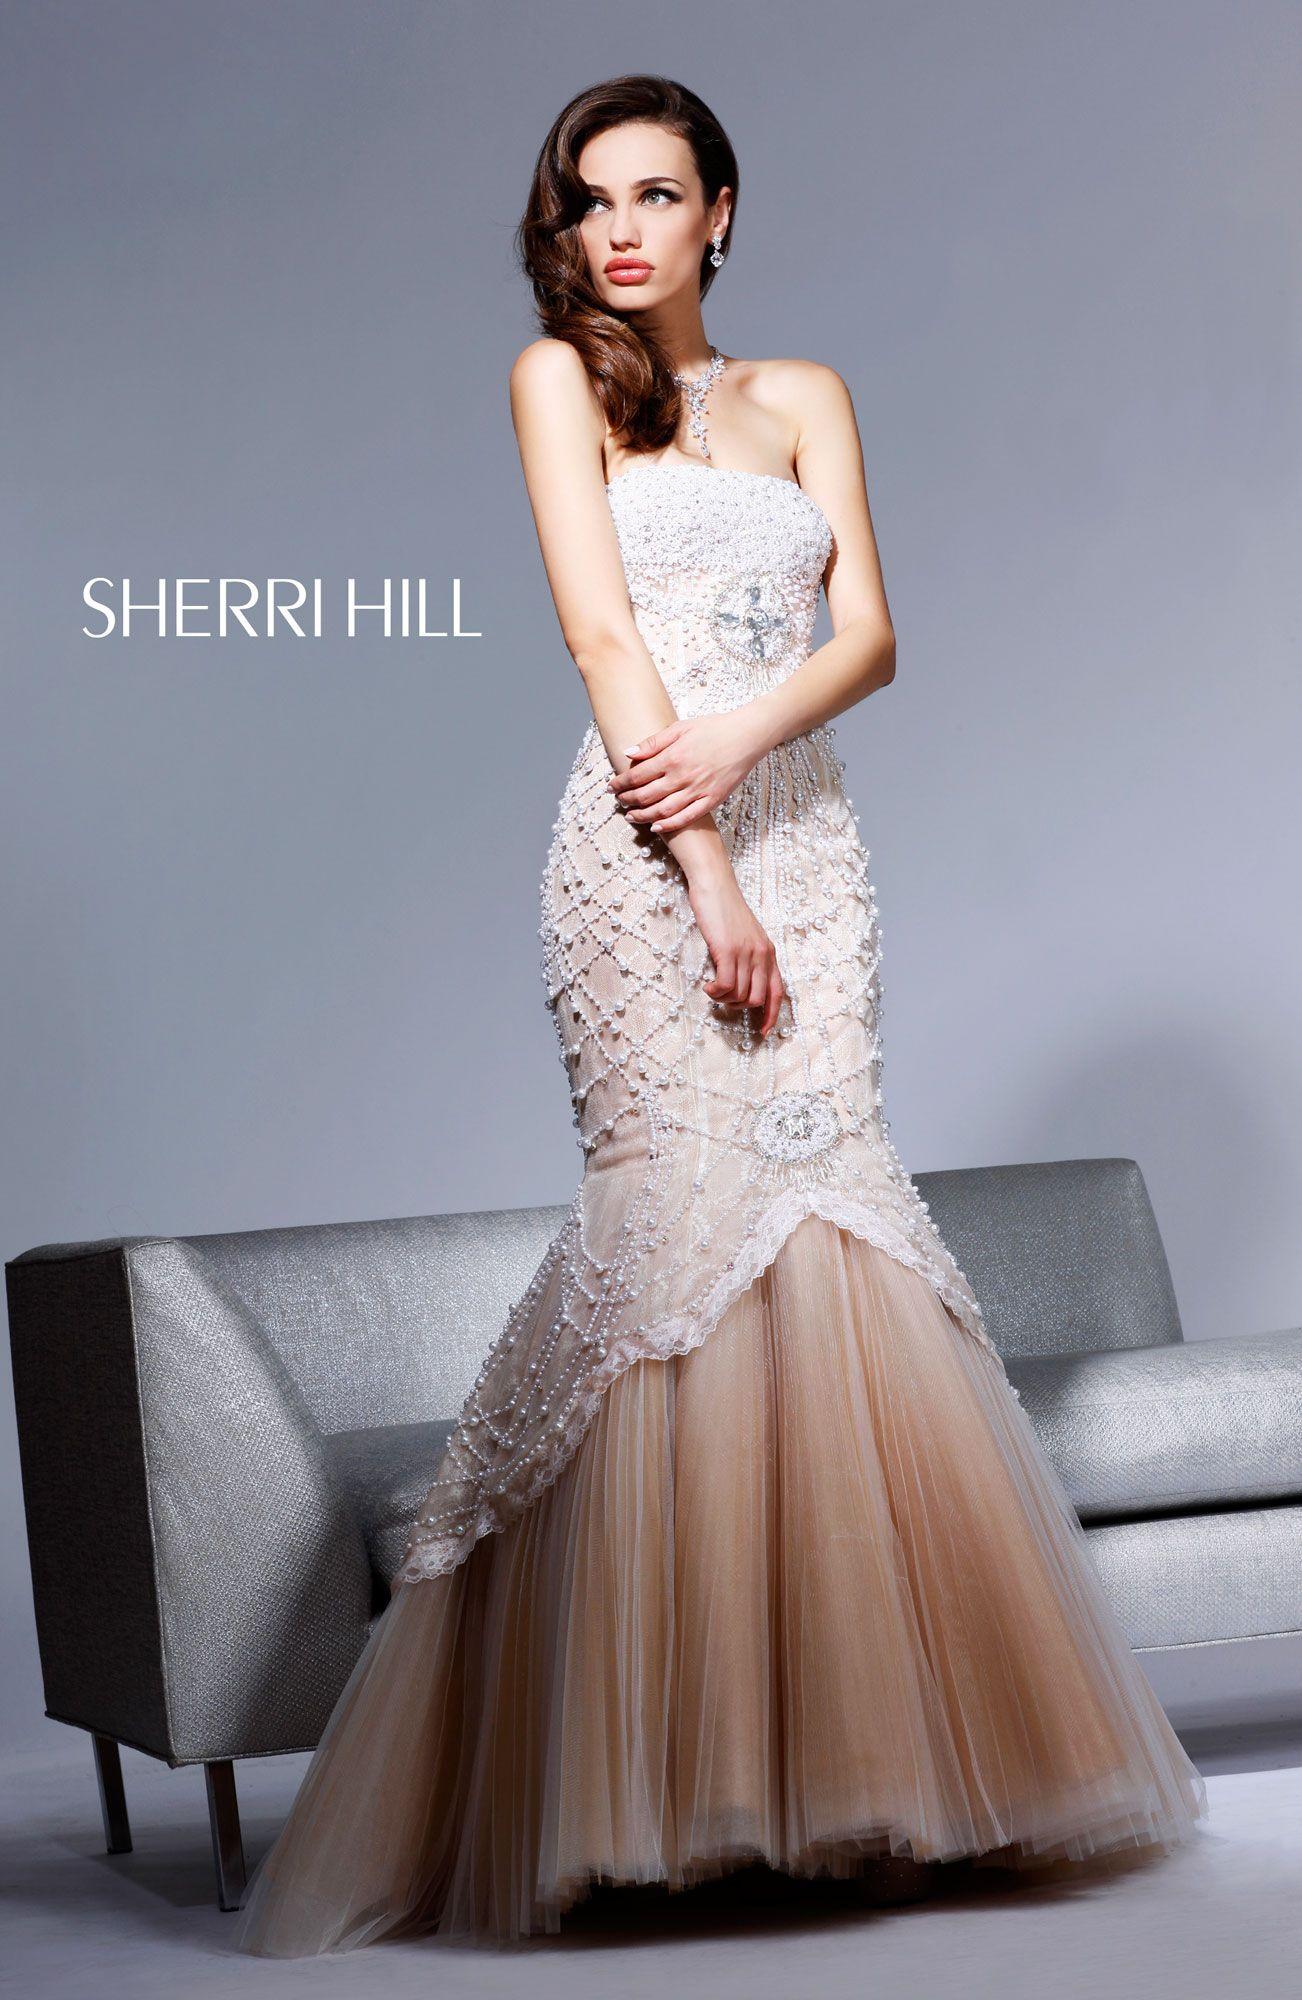 2013 Sherri Hill 2789 Lvory Nude Homecoming Dresses | Sherri Hill ...